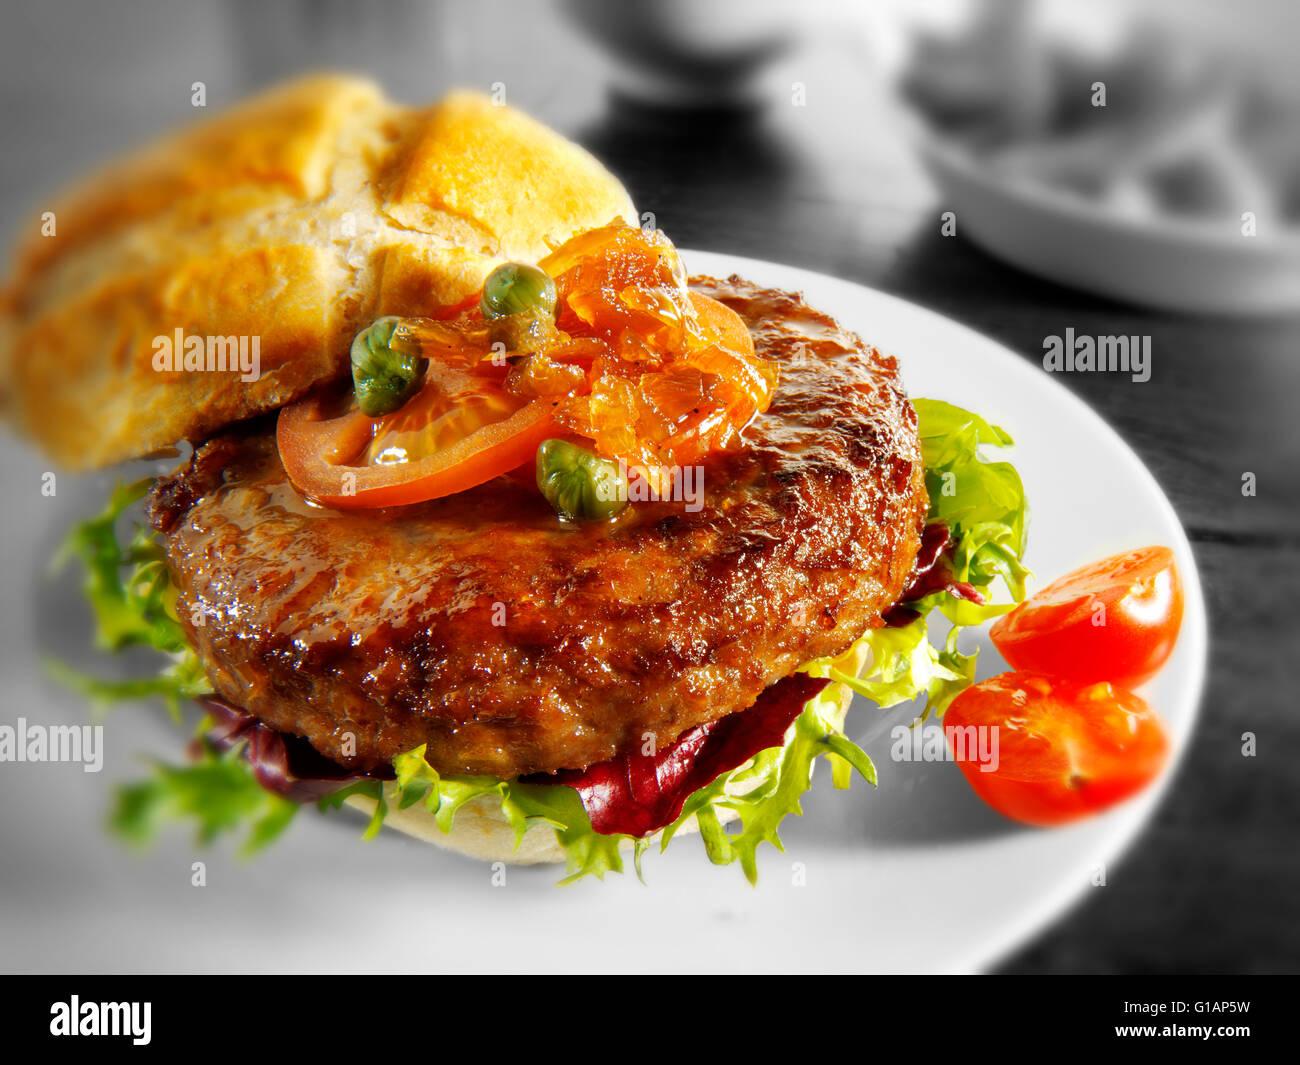 Hamburger or beef burger in a bun with relish and salad - Stock Image